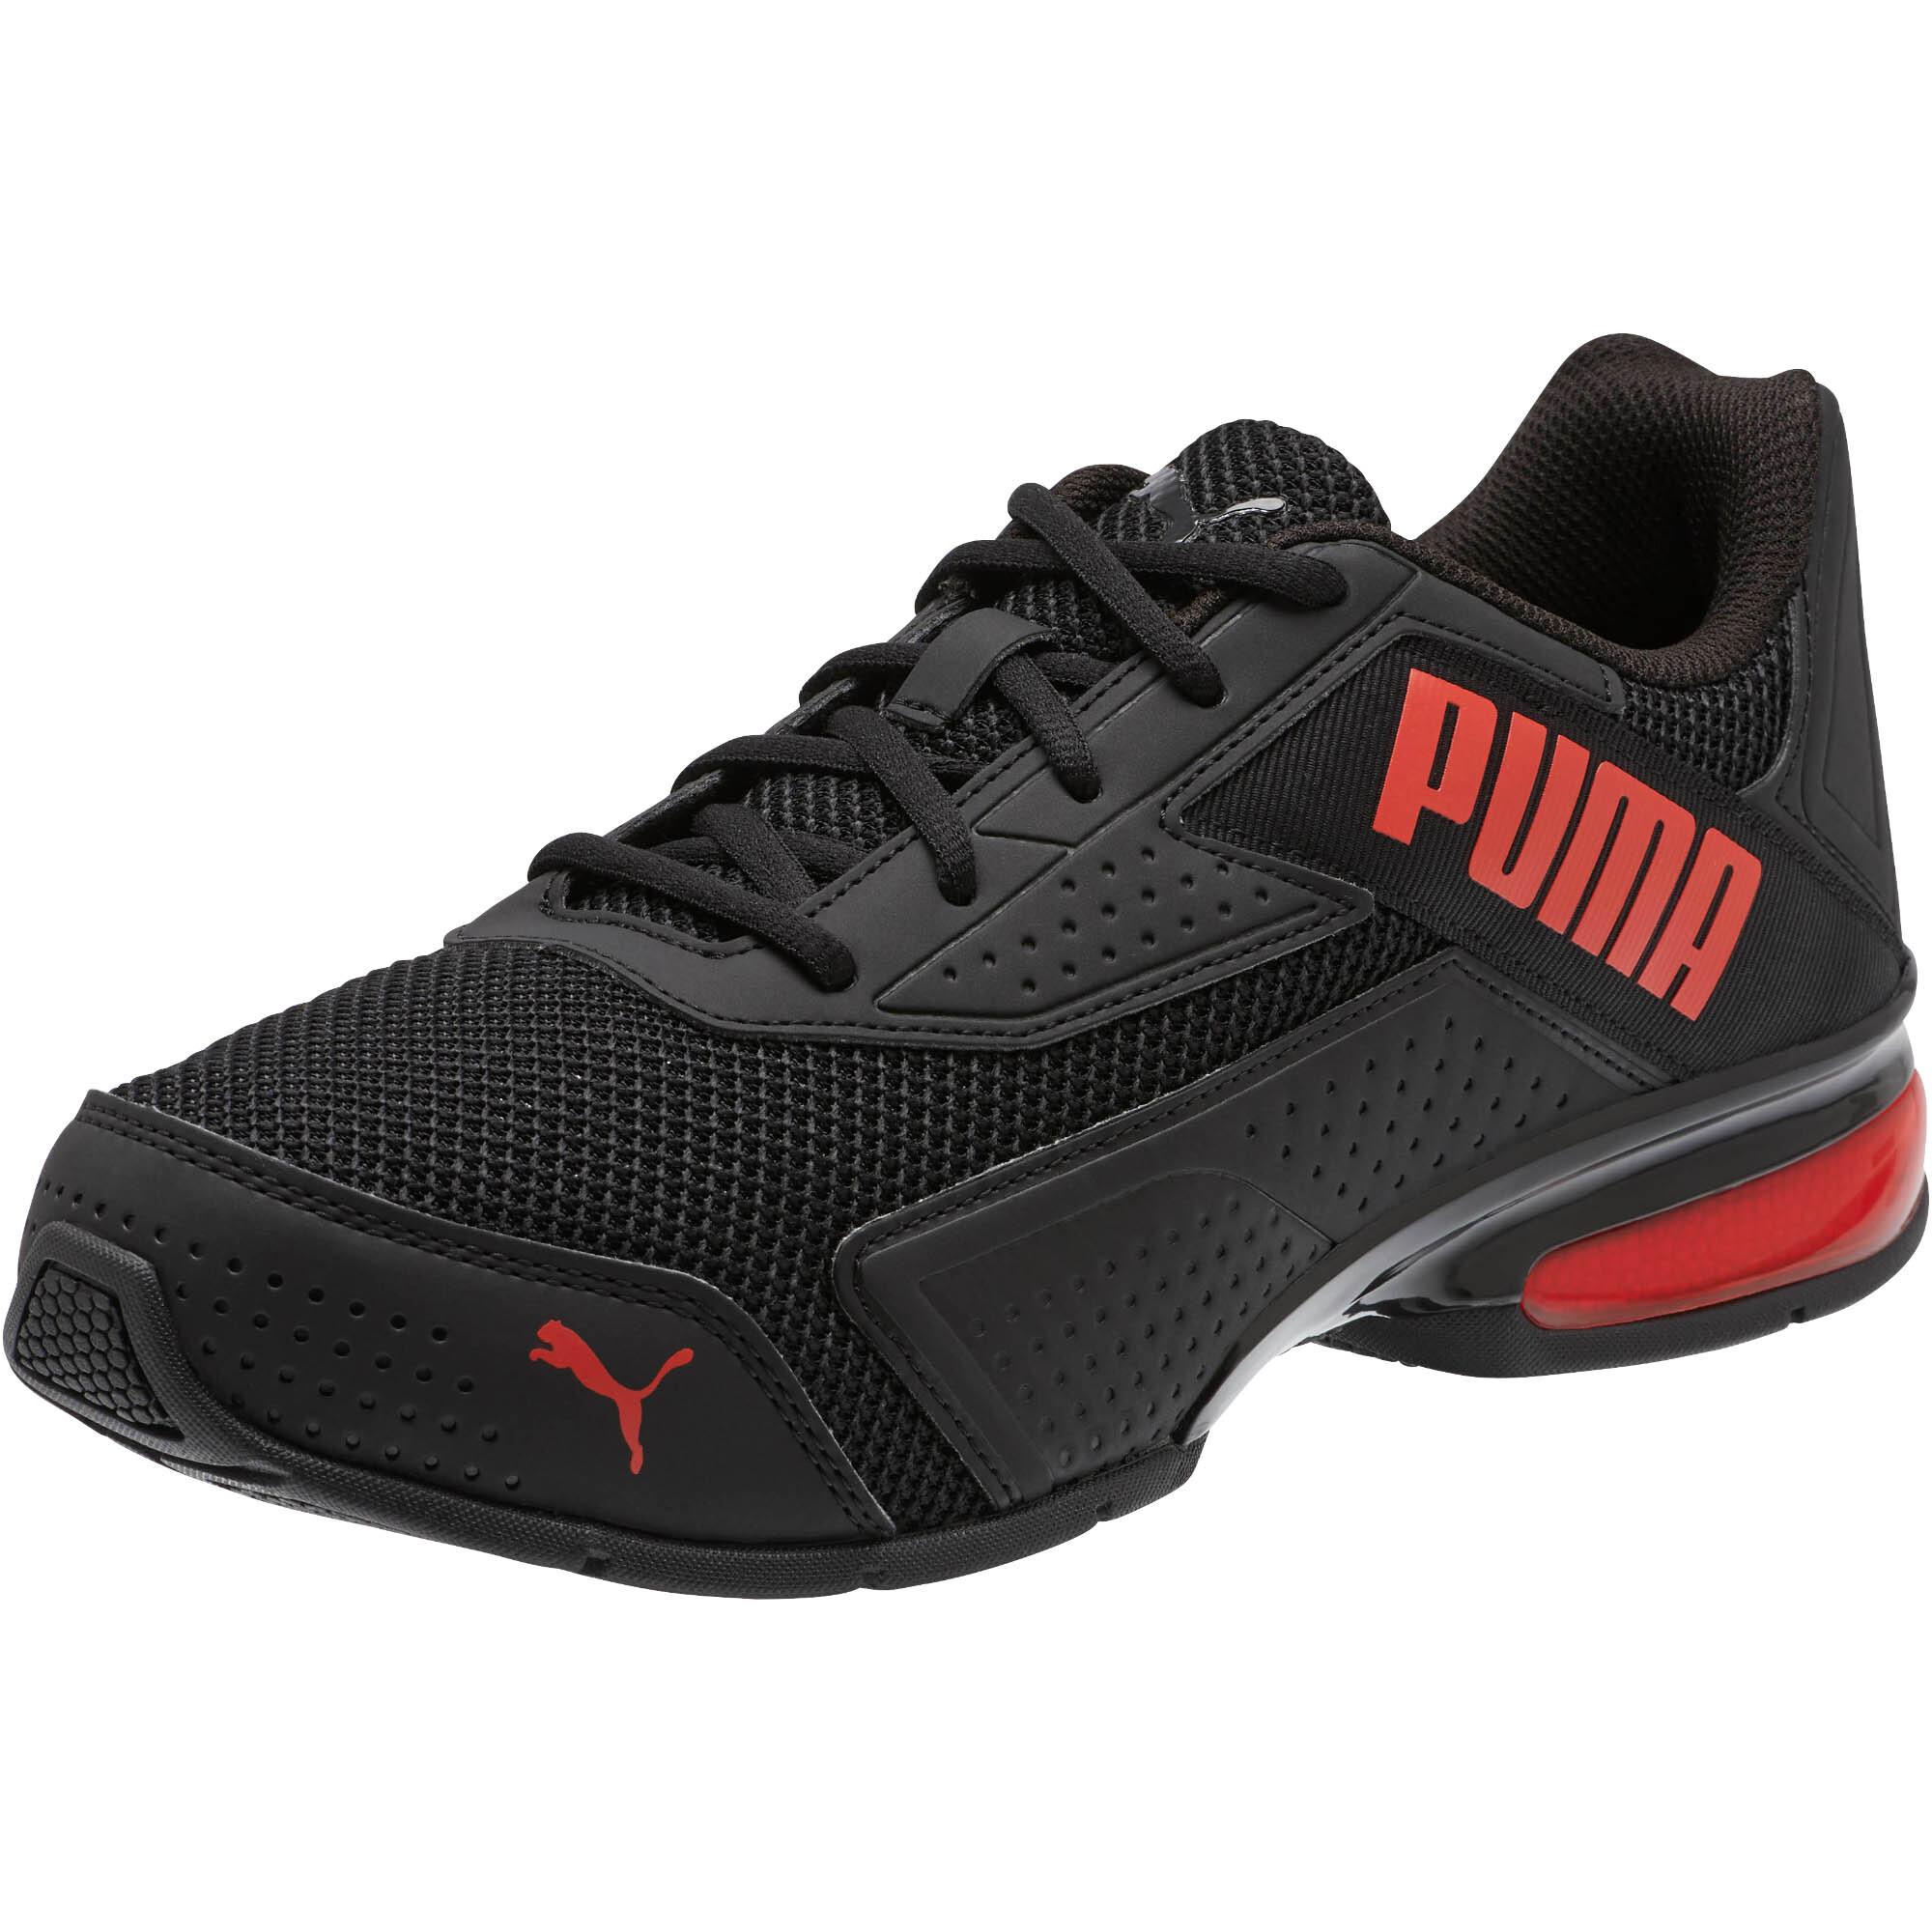 PUMA-Leader-VT-Bold-Men-039-s-Training-Shoes-Men-Shoe-Running thumbnail 14